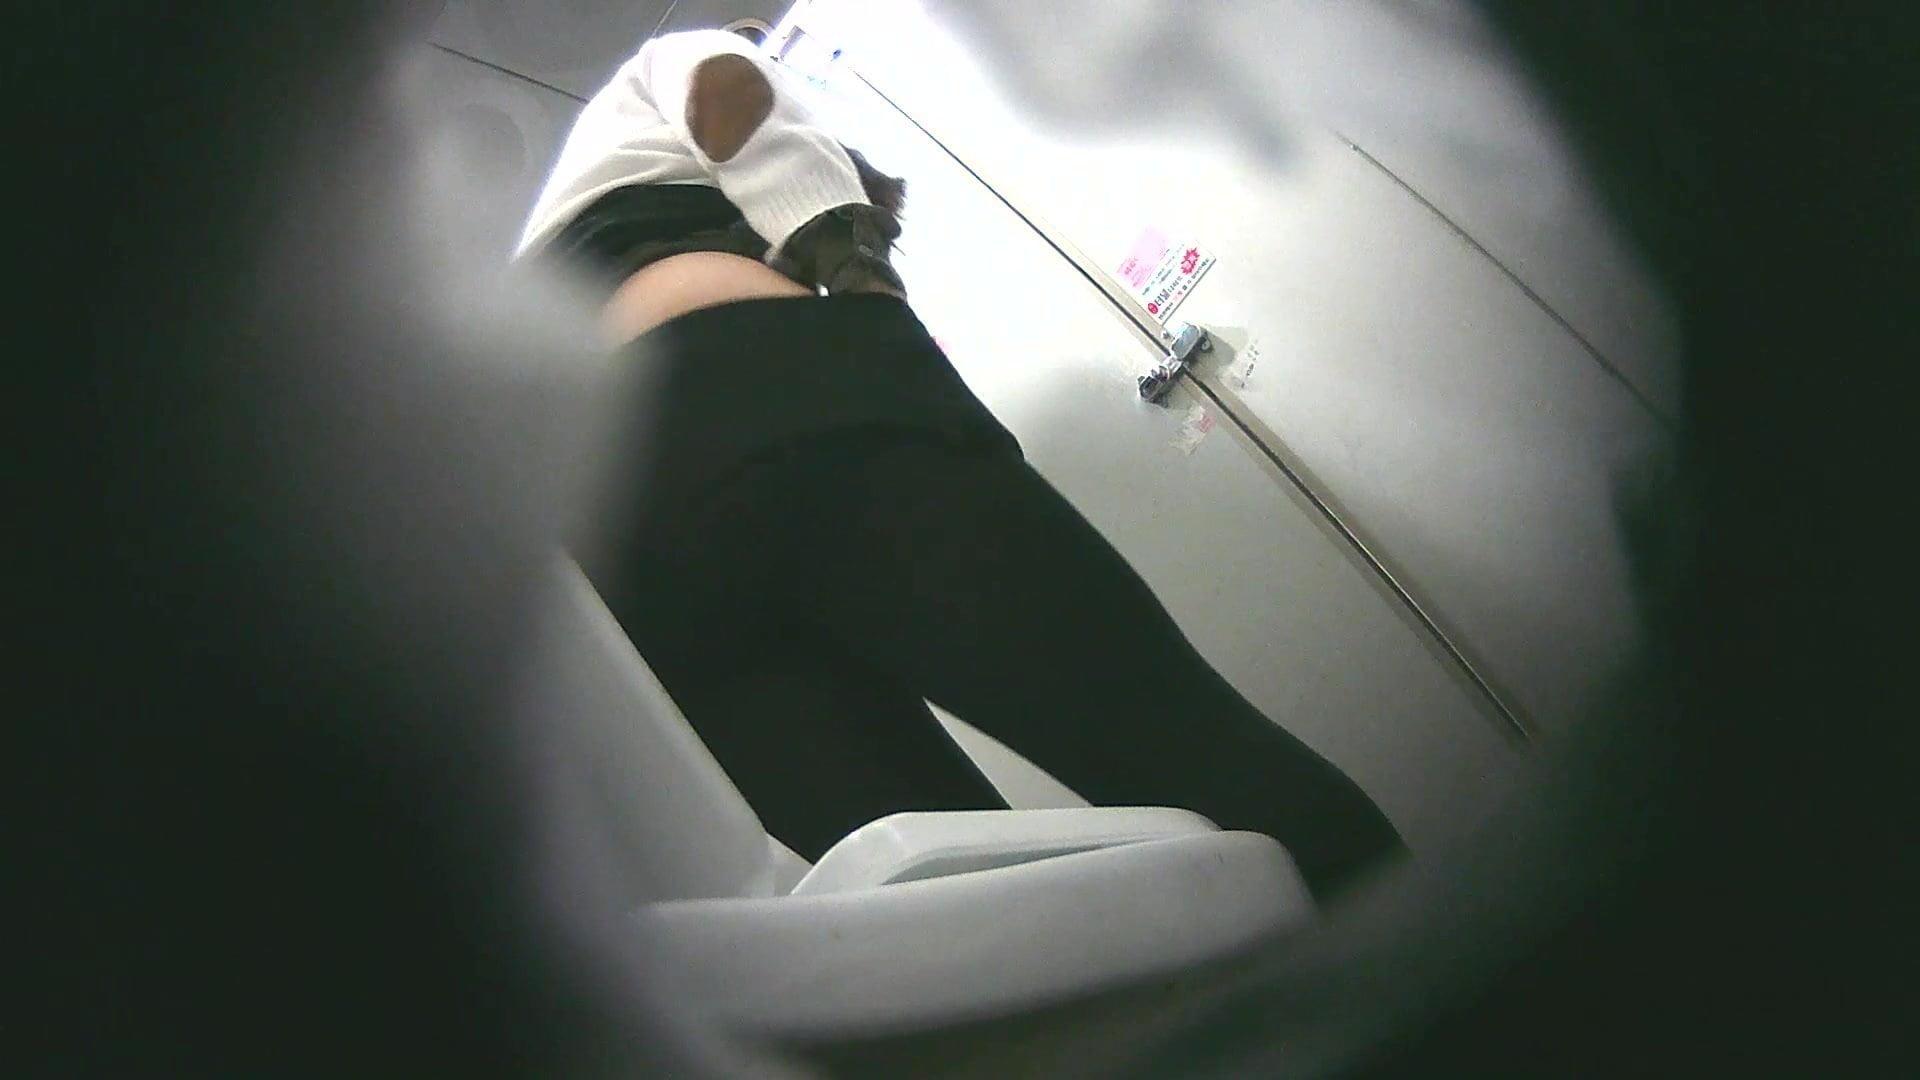 korean bathroom spy 13